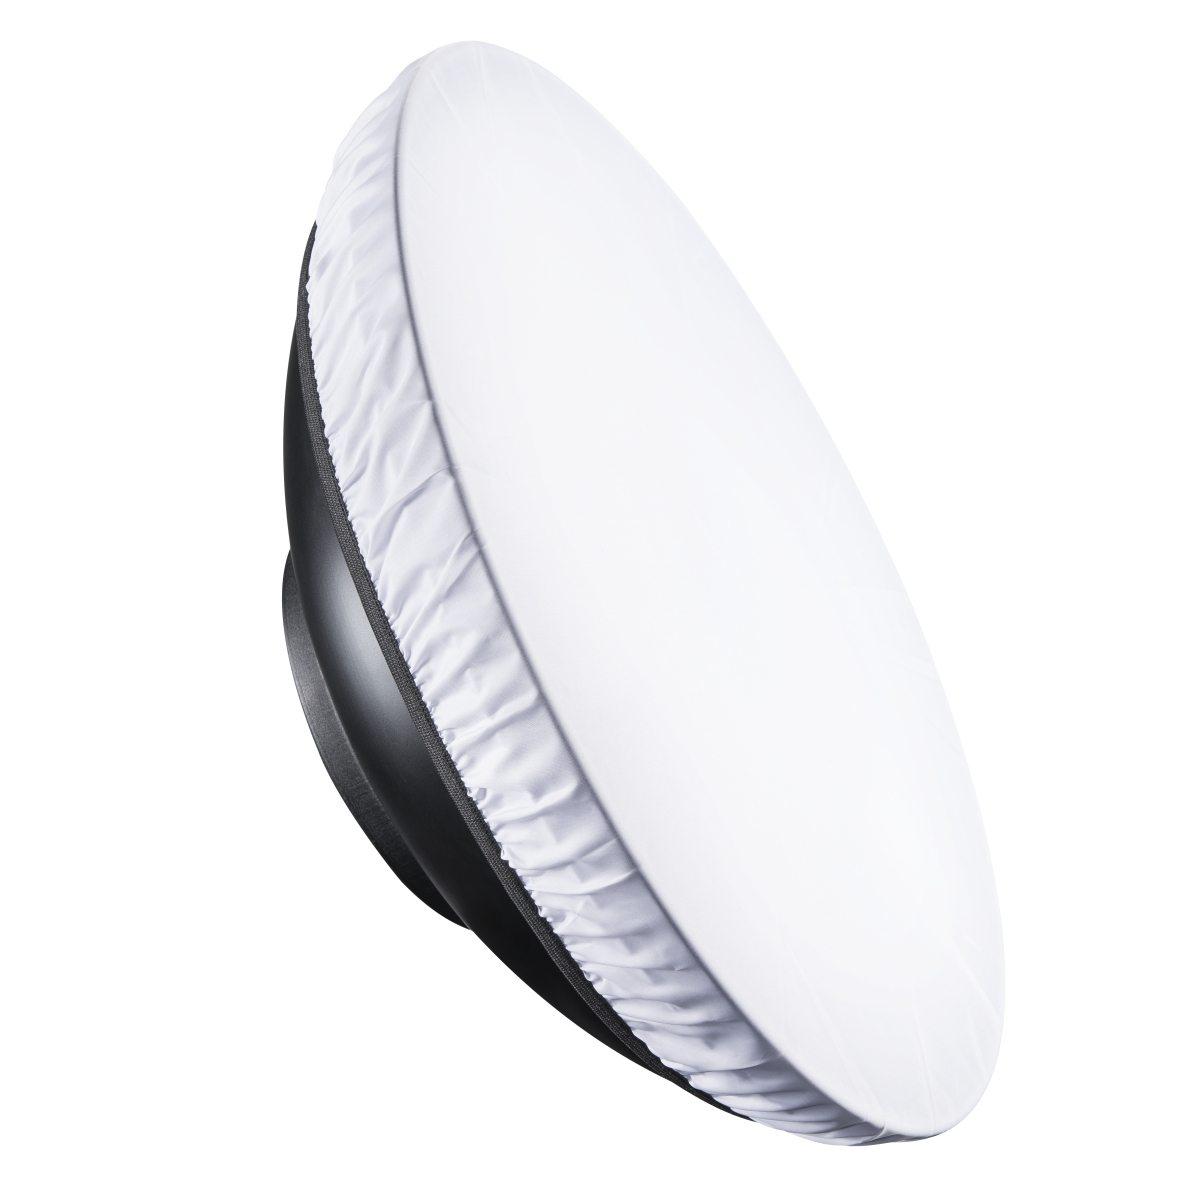 Walimex Beauty Dish Diffuser, 50cm